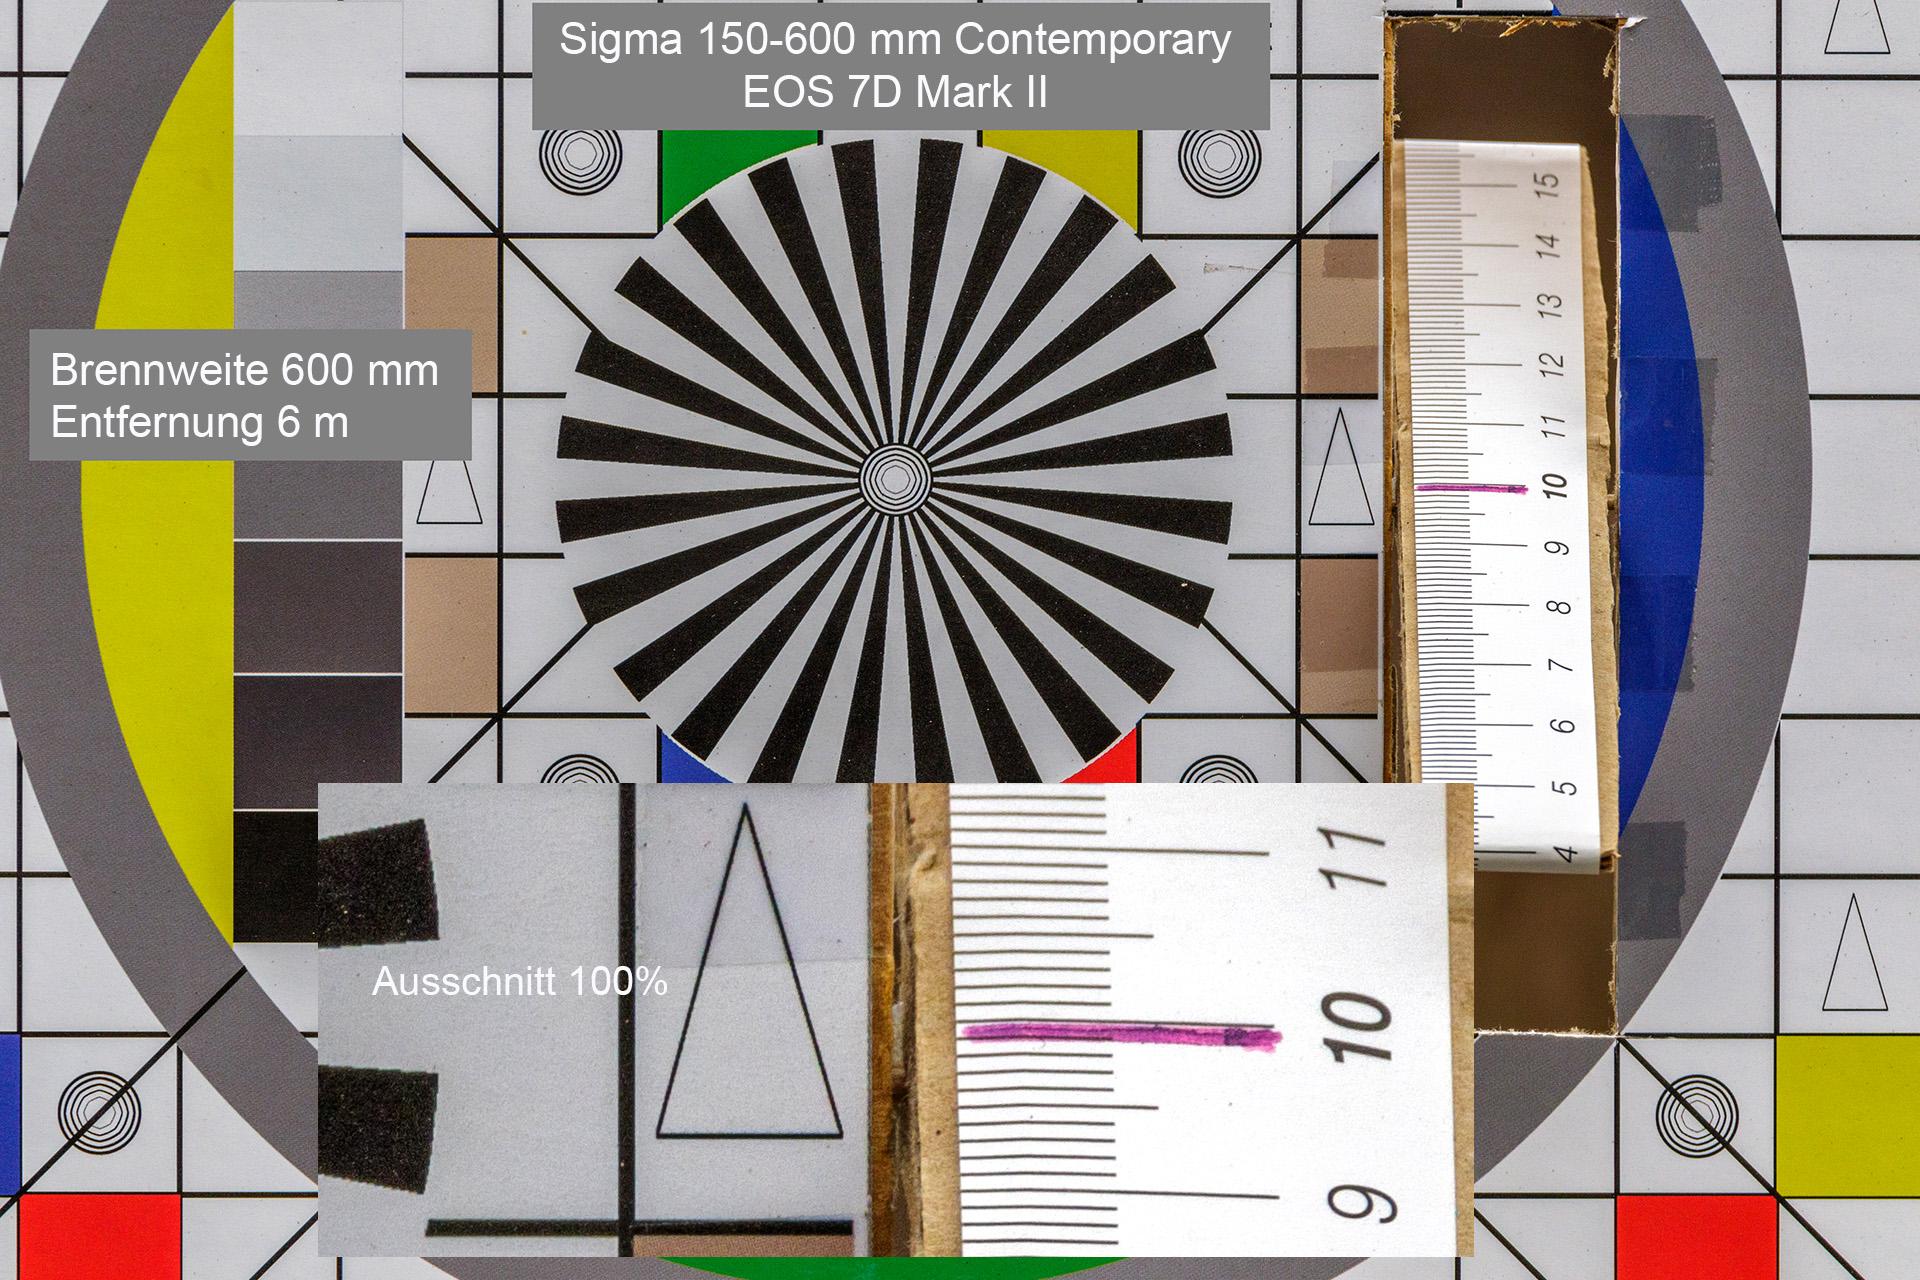 Testaufnahmen, Sigma 150-600 mm, 7D Mark II, 6 Meter, 600 mm